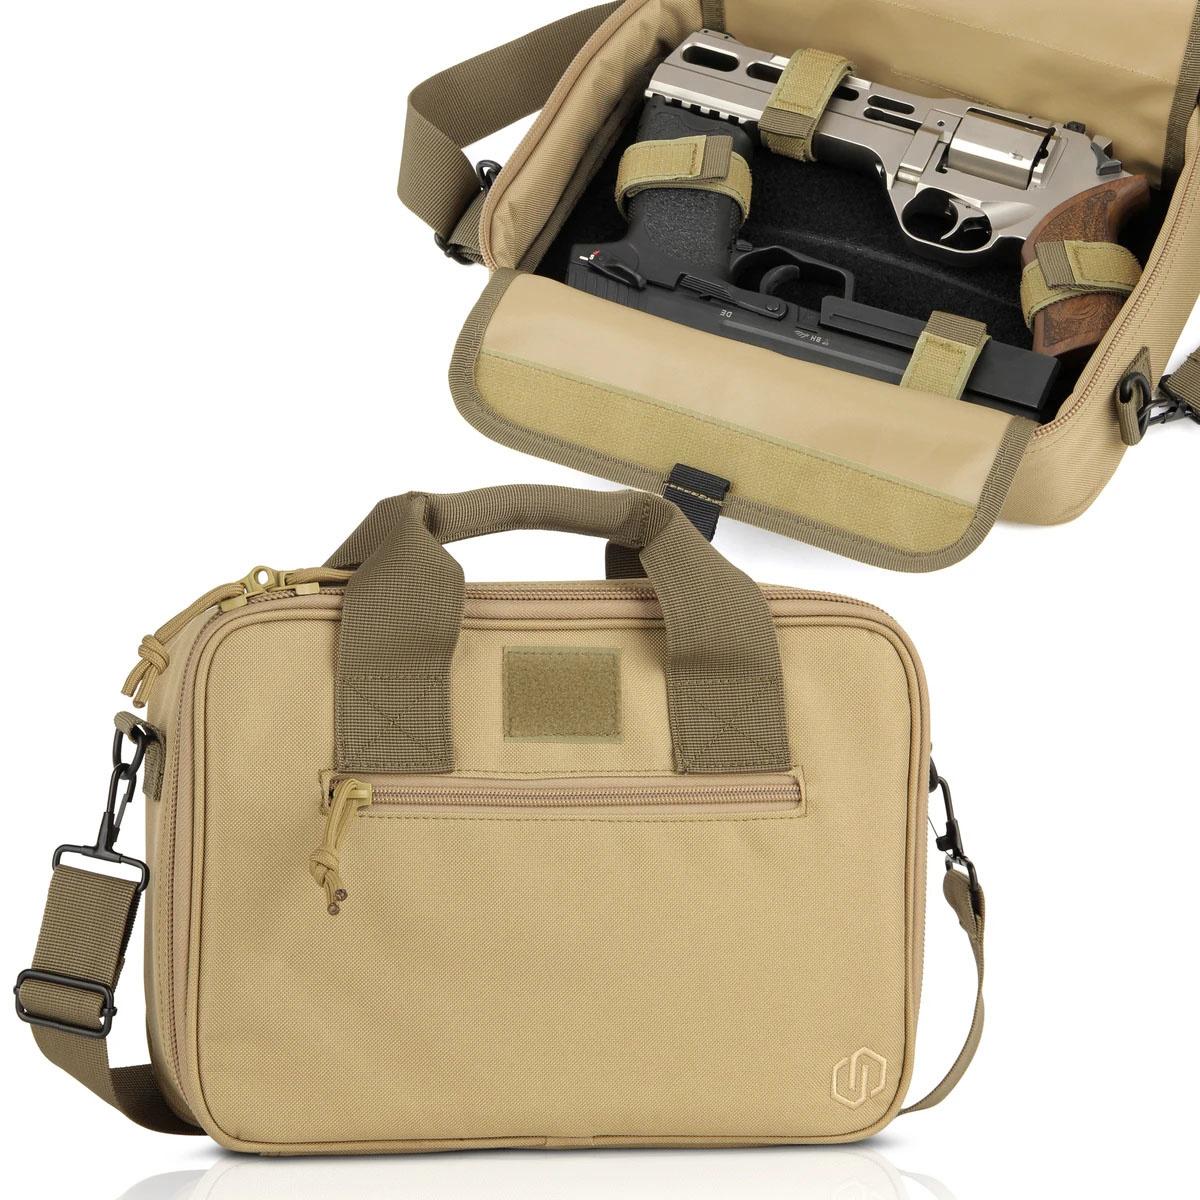 Savior Equipment Savior Covert Pistol case